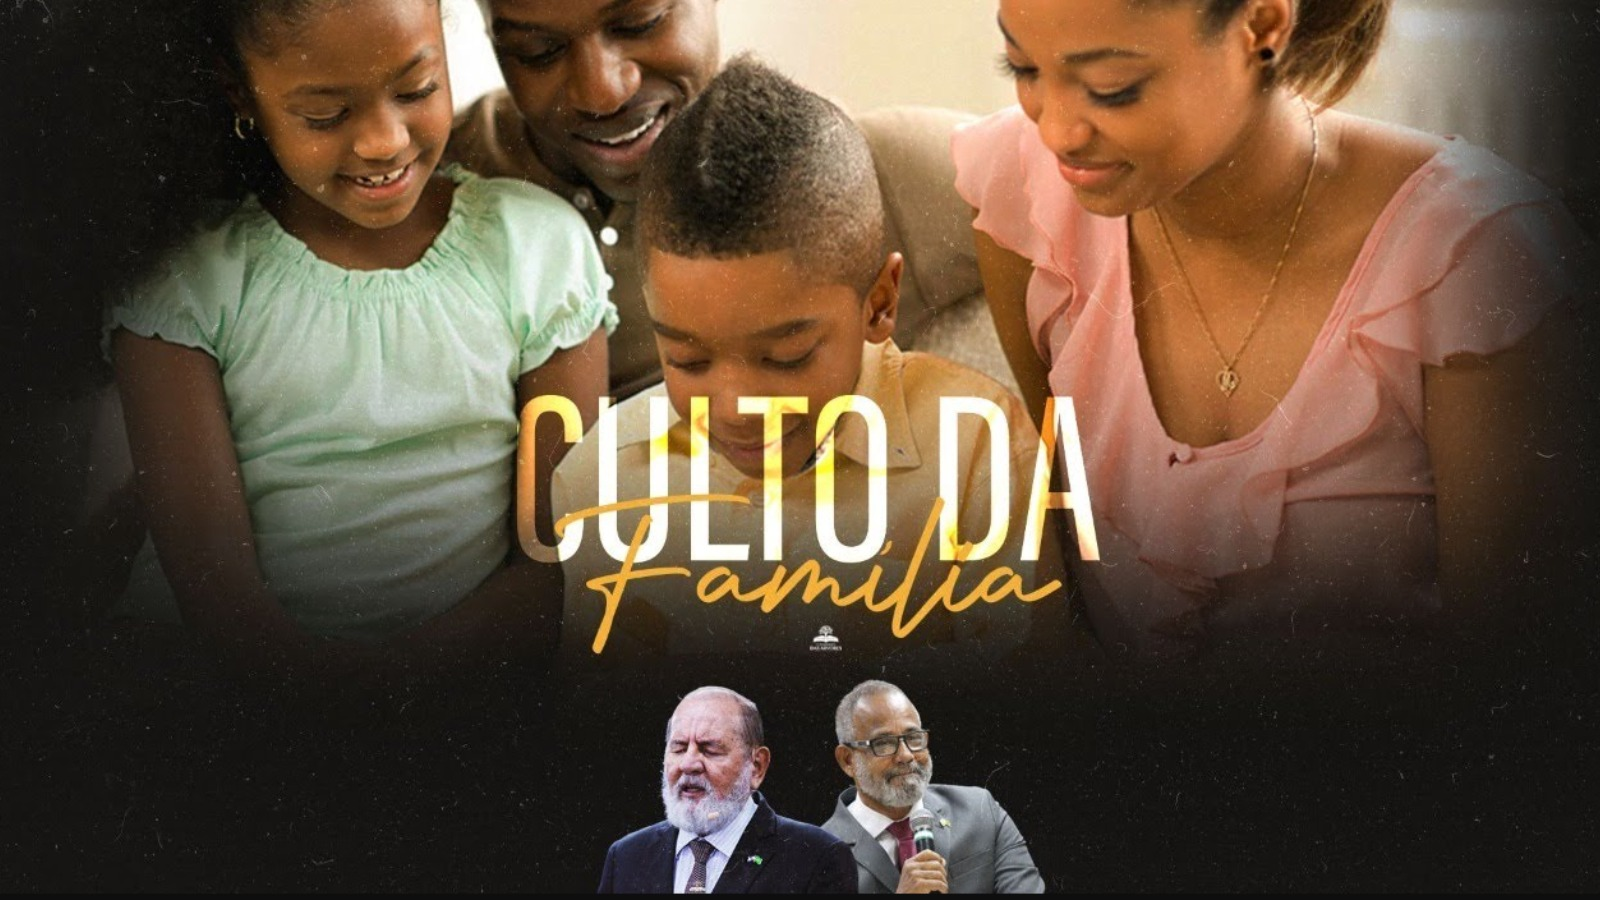 CULTO DA FAMÍLIA  - OFIR - 04/08/2021